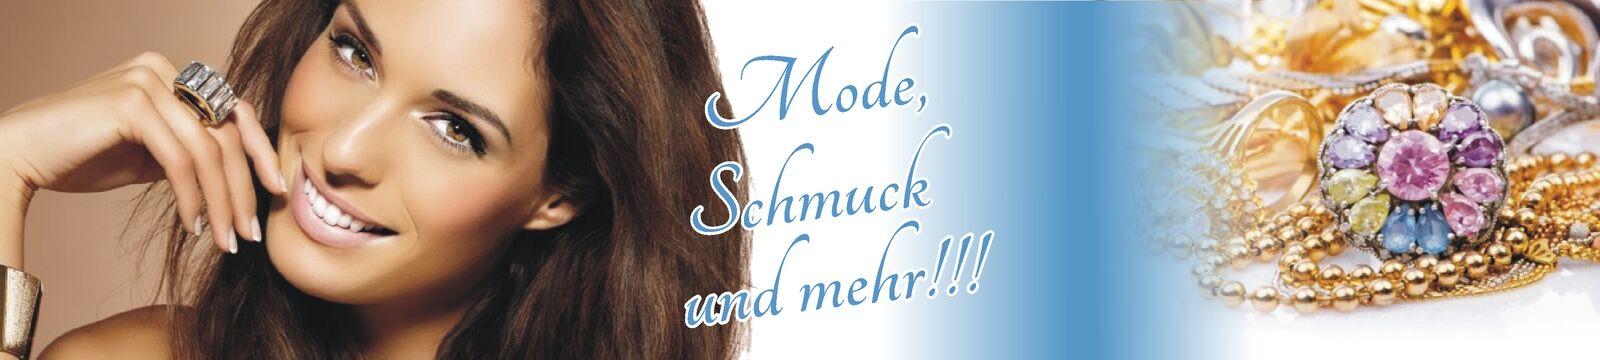 modefabrik24